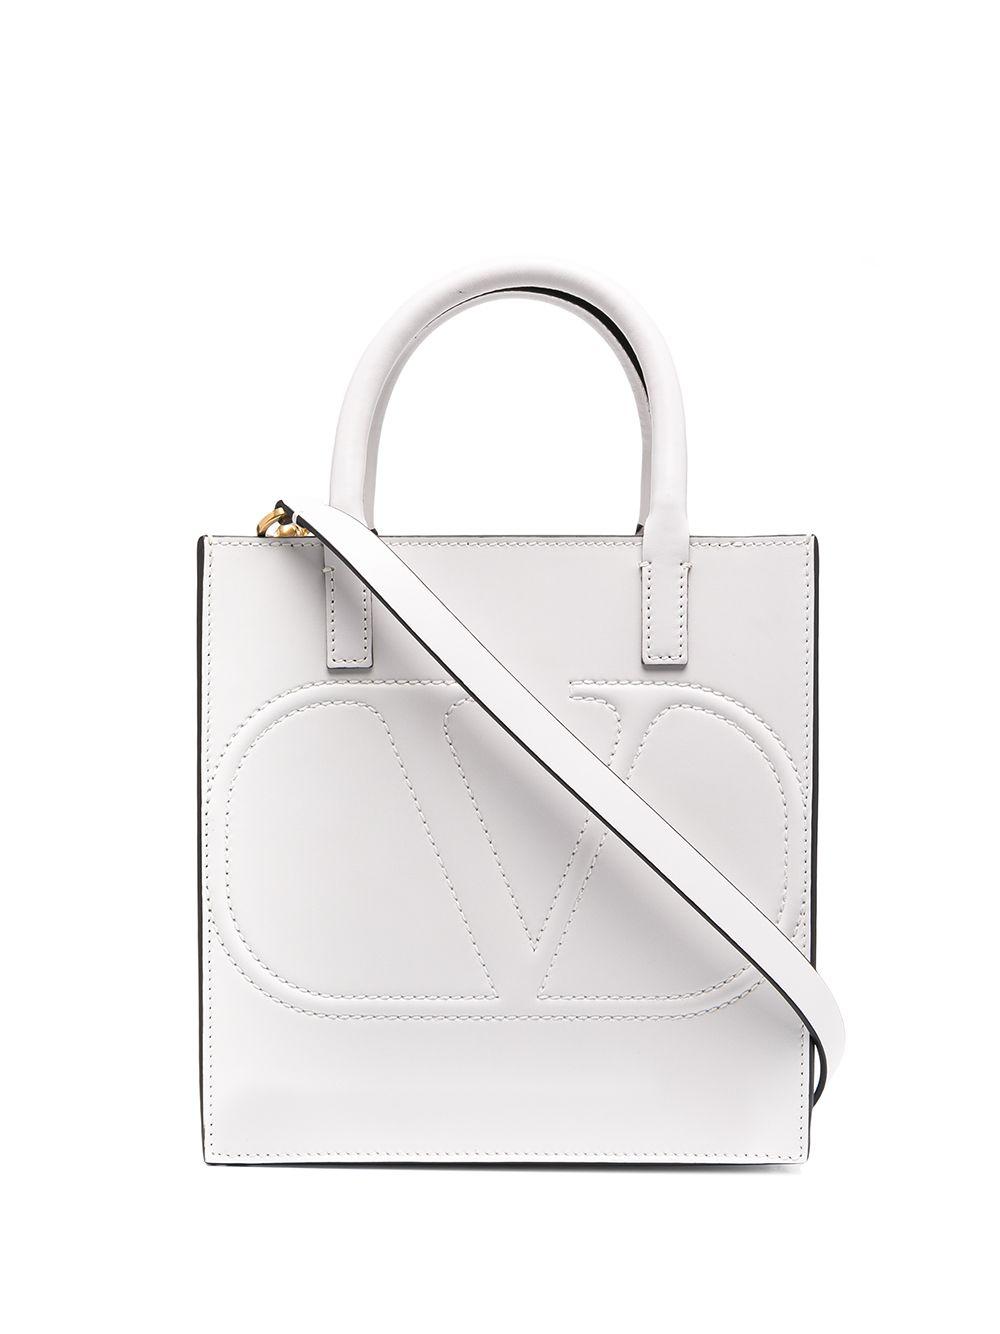 Vlogo Small Leather Handbag